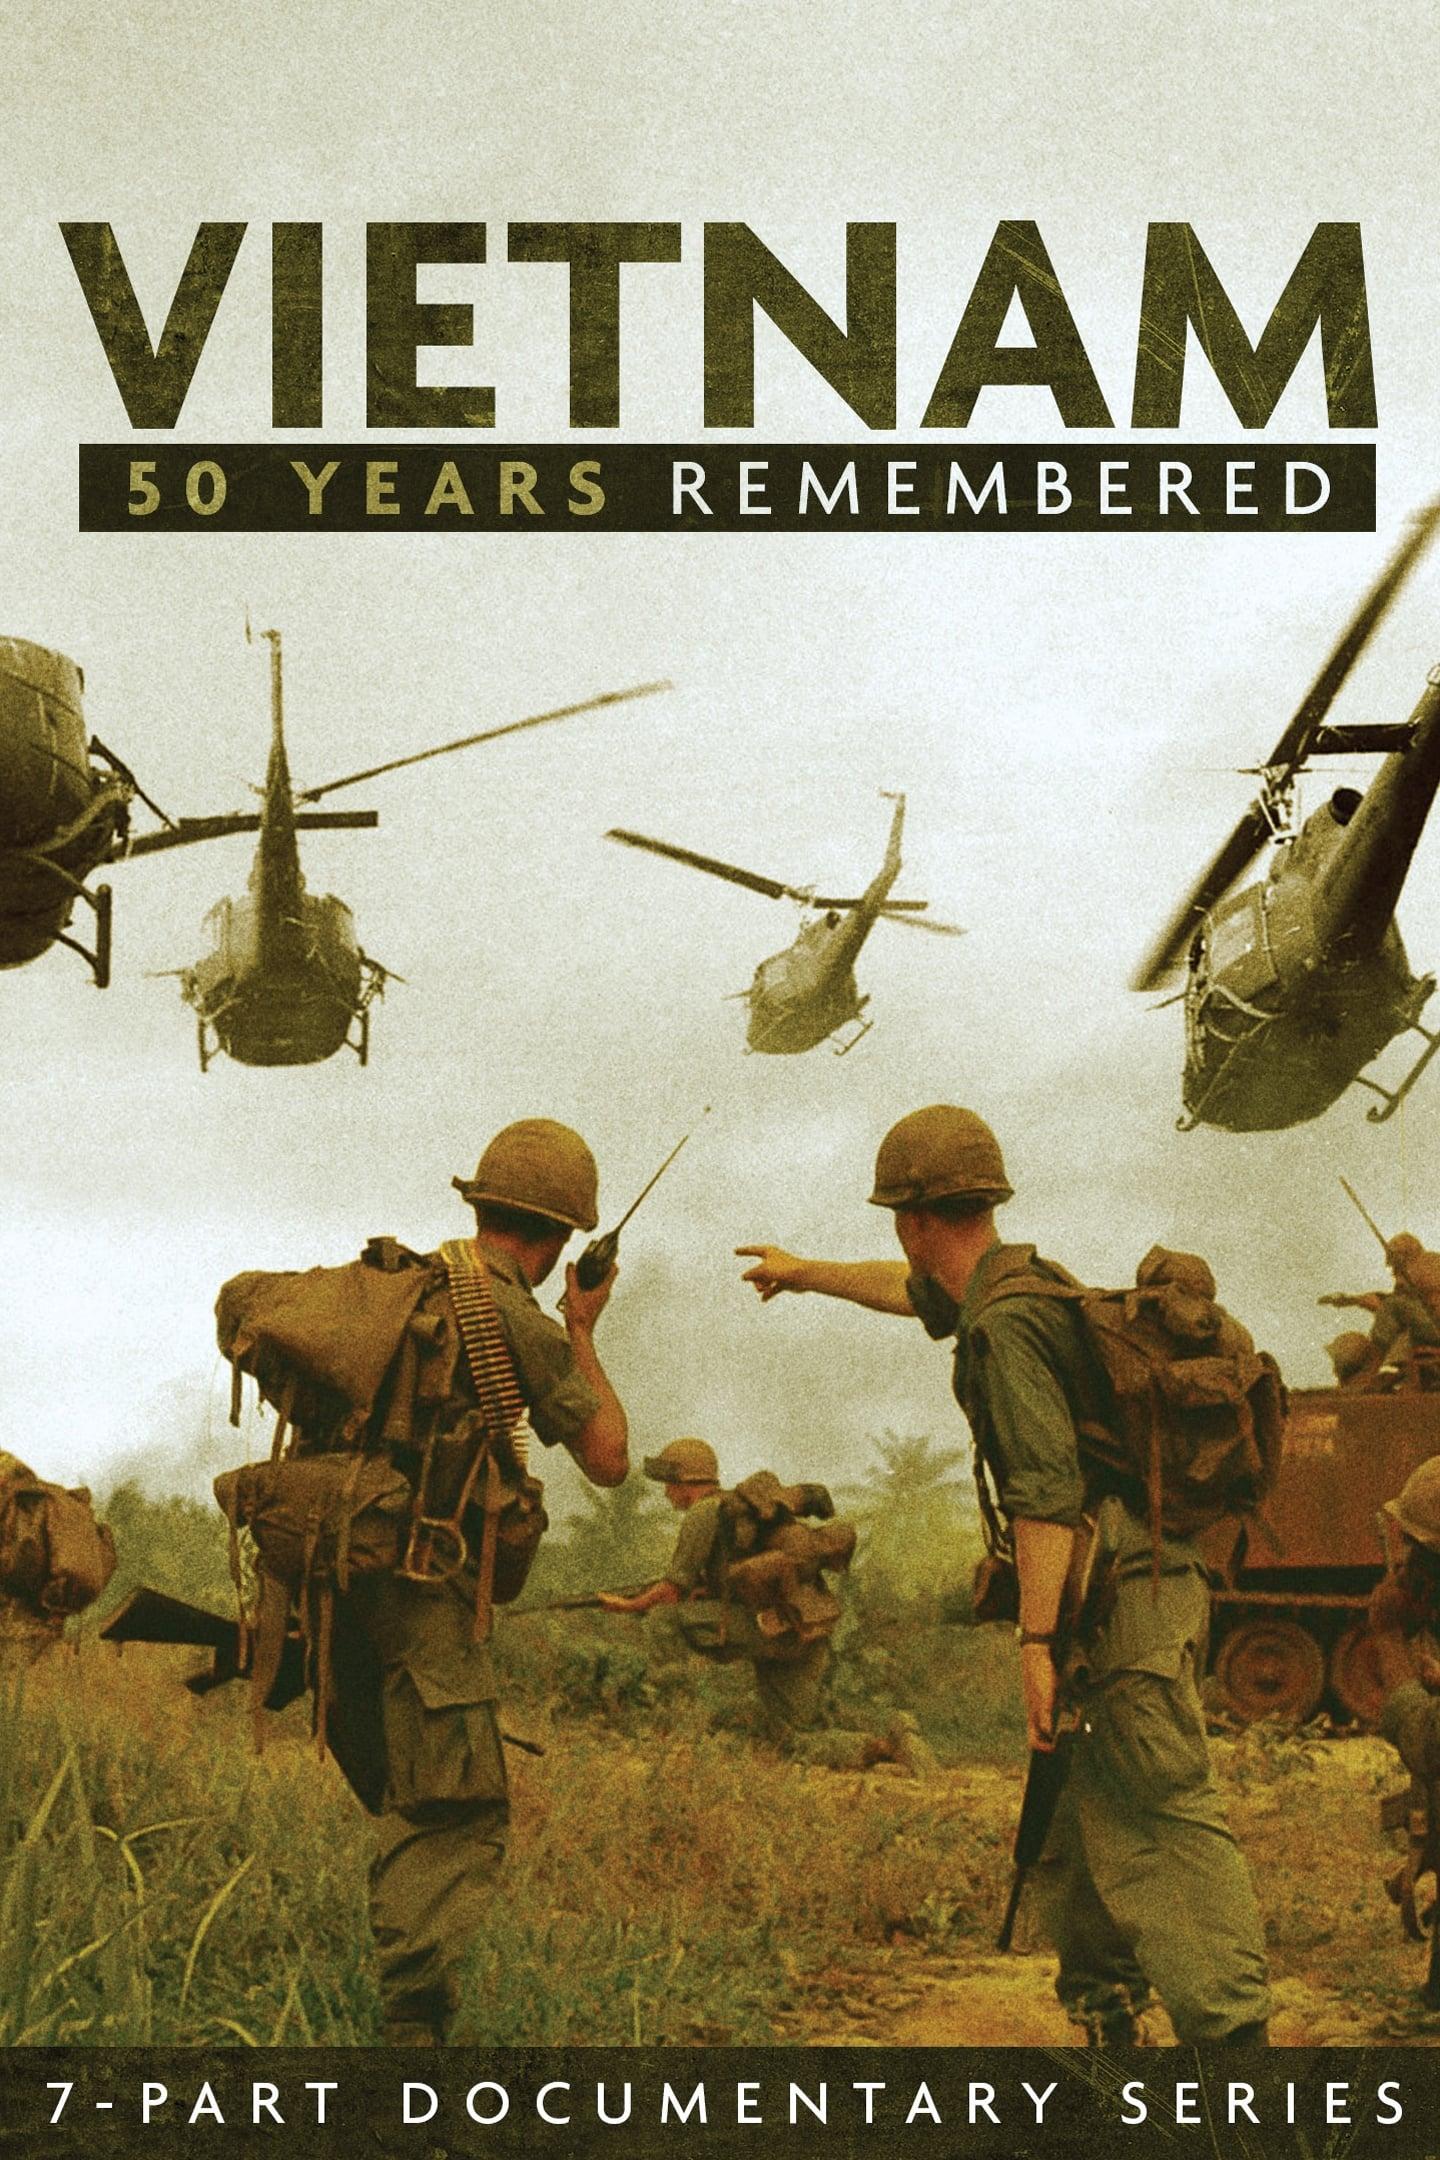 Vietnam: 50 Years Remembered TV Shows About Vietnam War